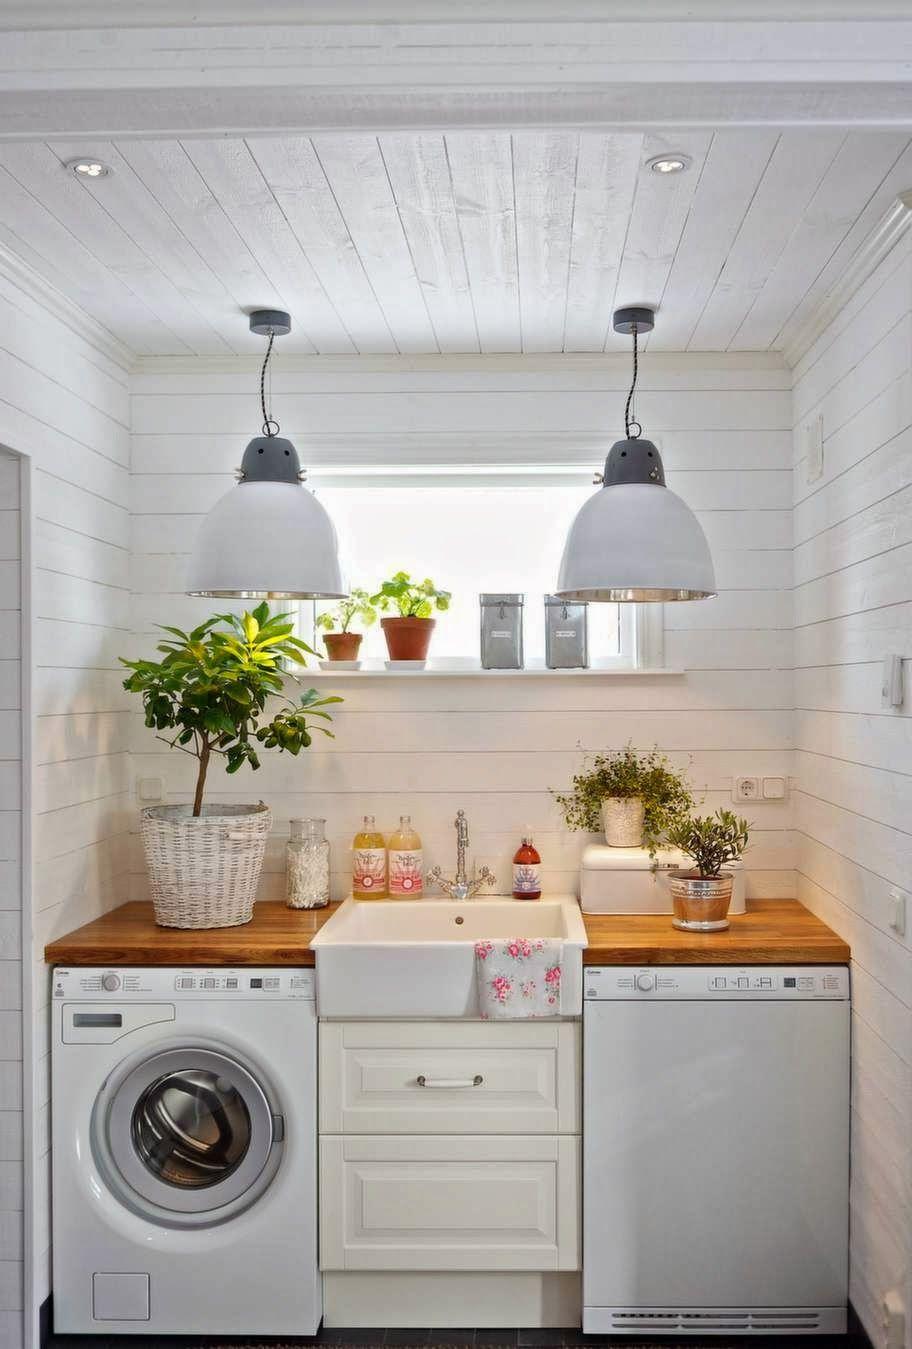 Cepaynasi 집에 관한 아이디어 pinterest laundry laundry